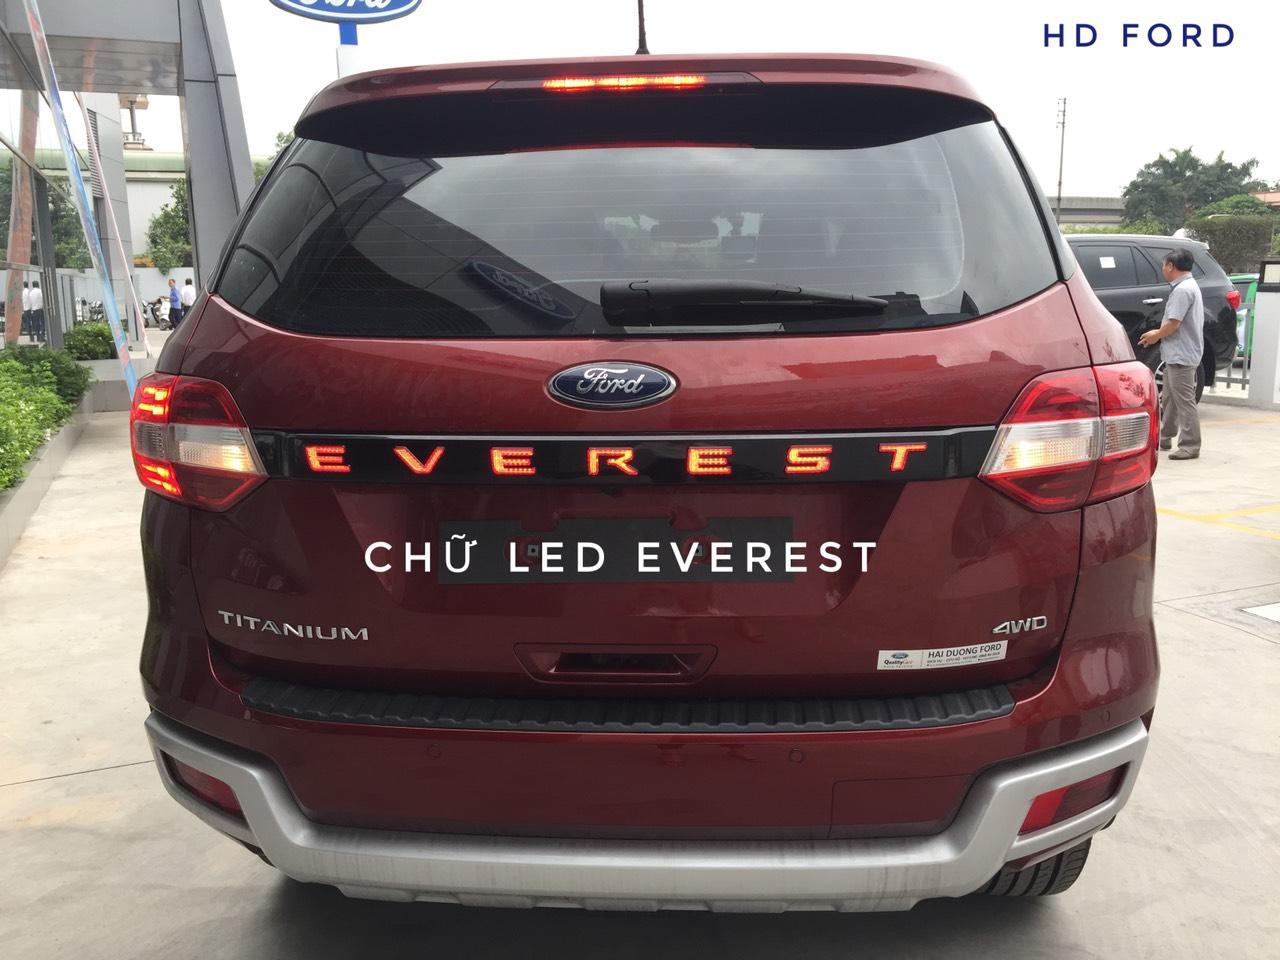 Chữ LED Everest